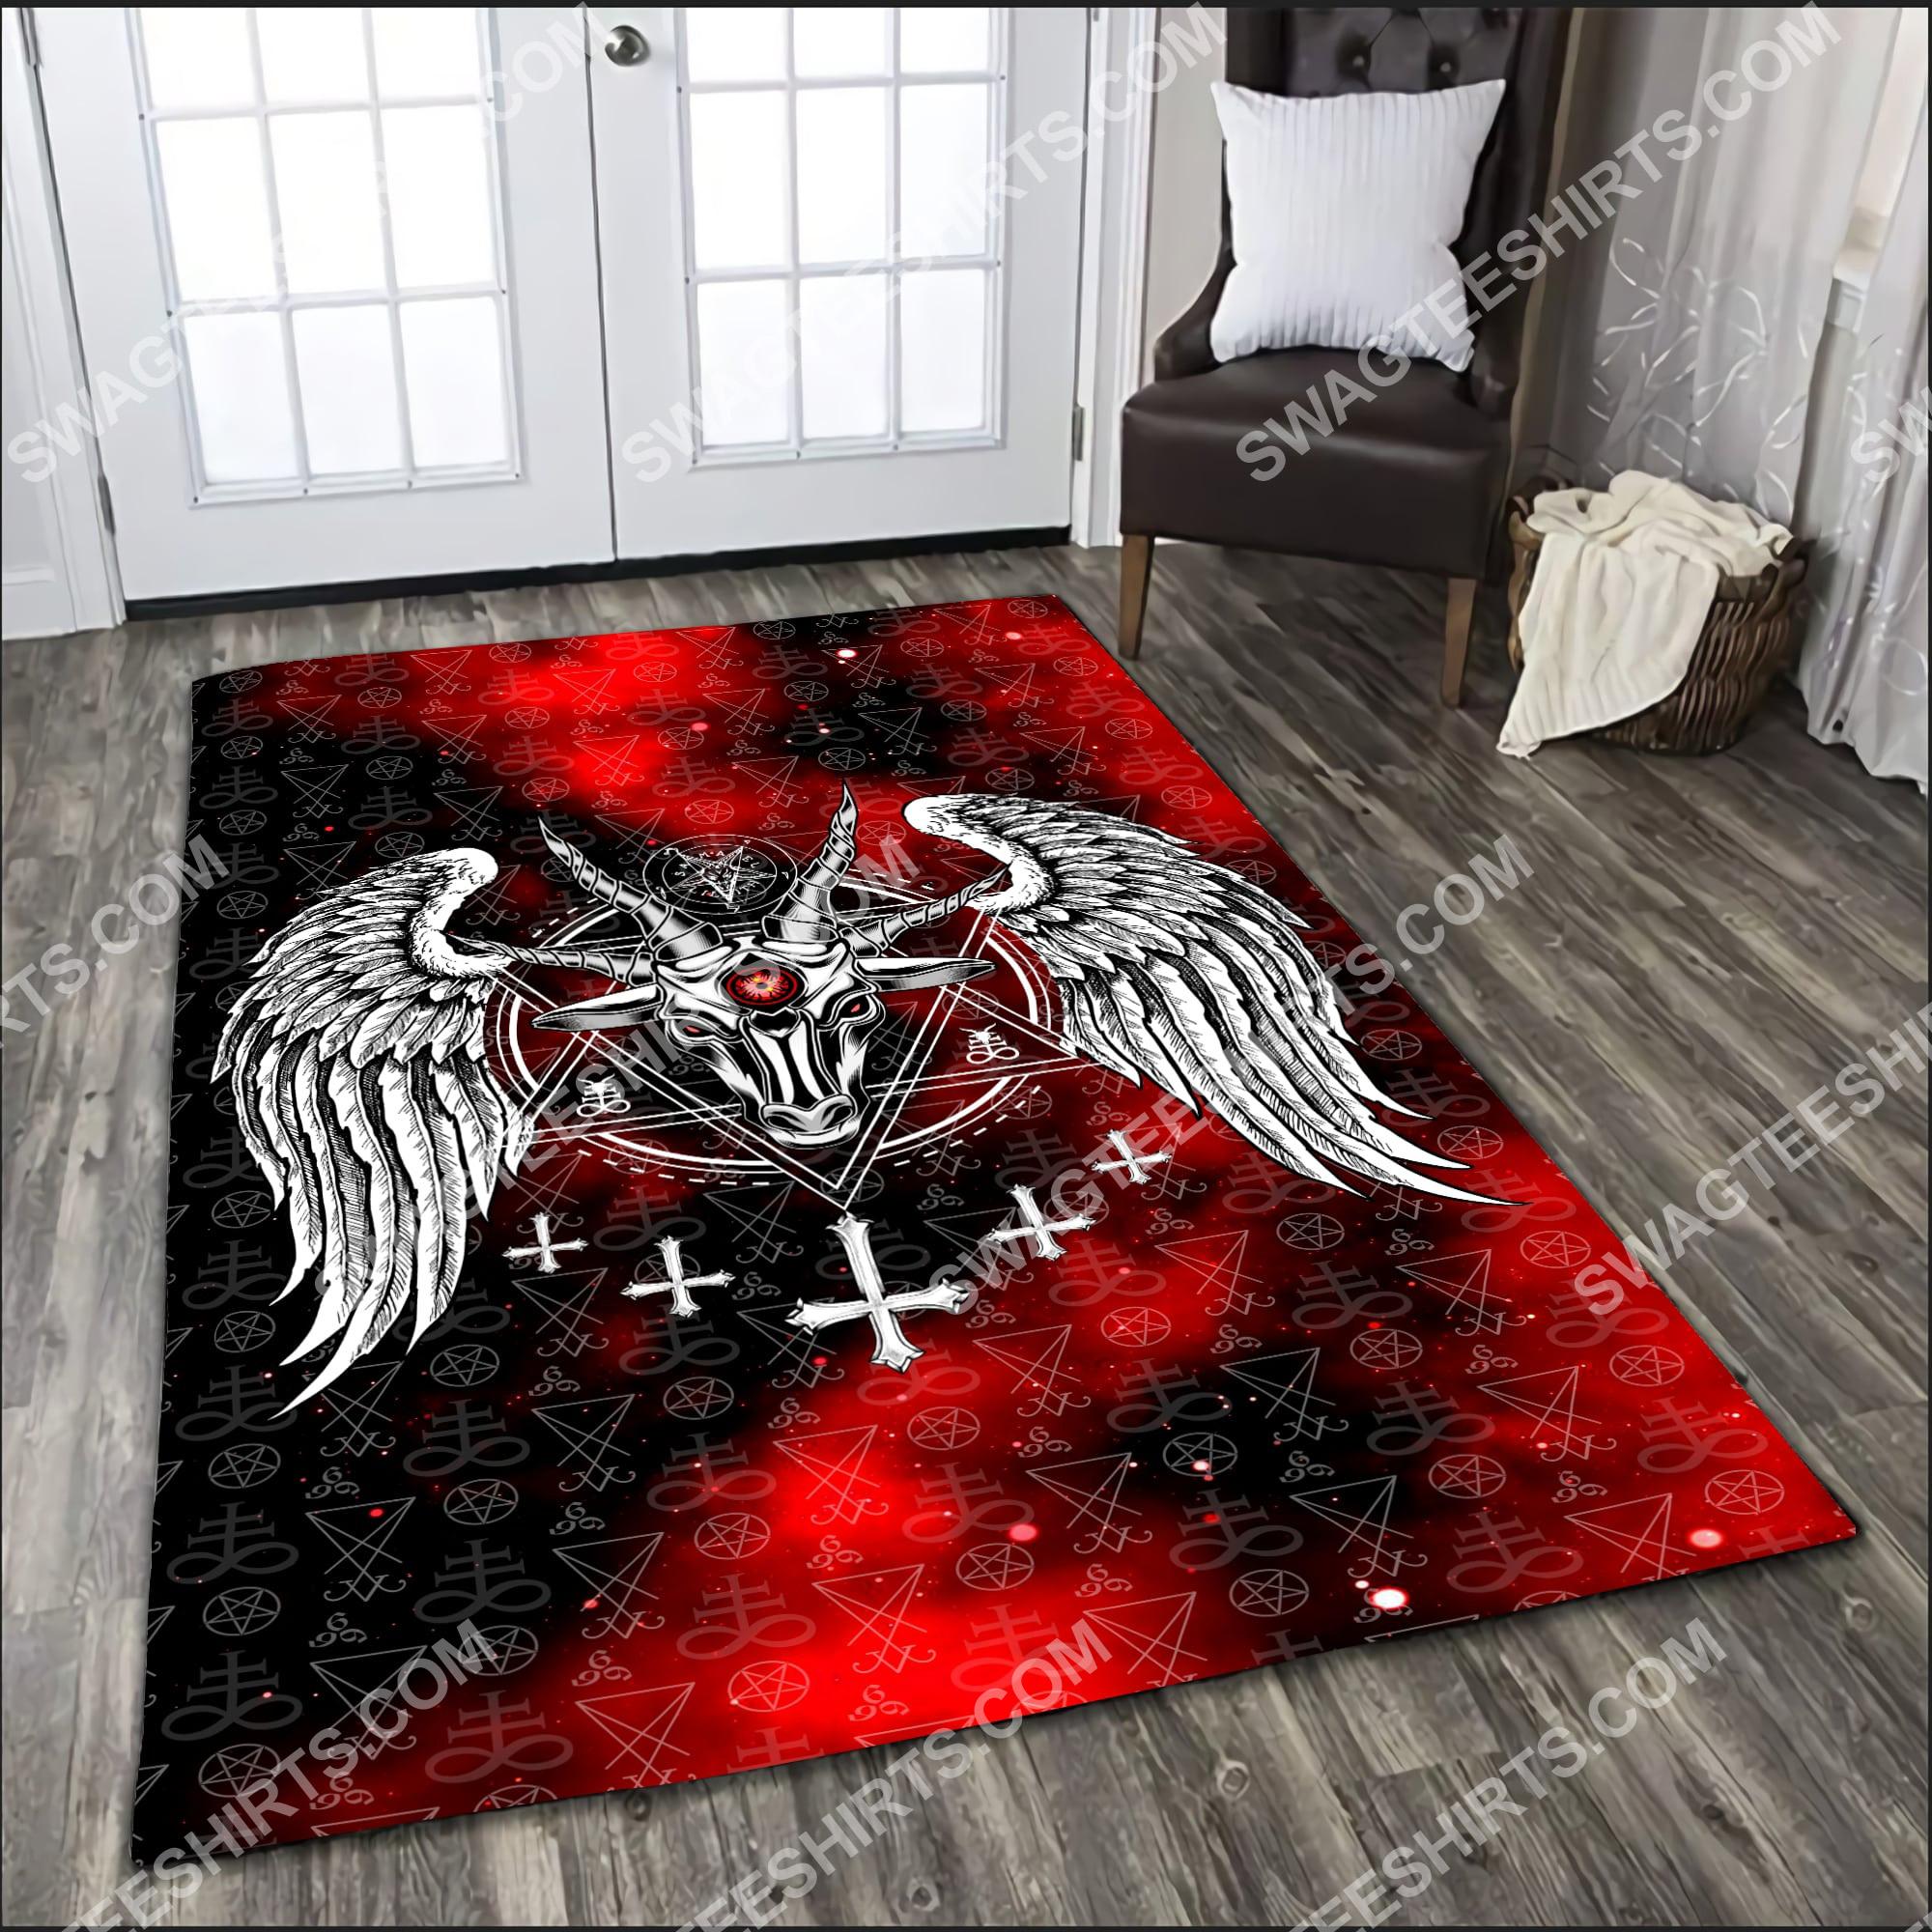 the satanic symbol all over printed rug 3(1) - Copy